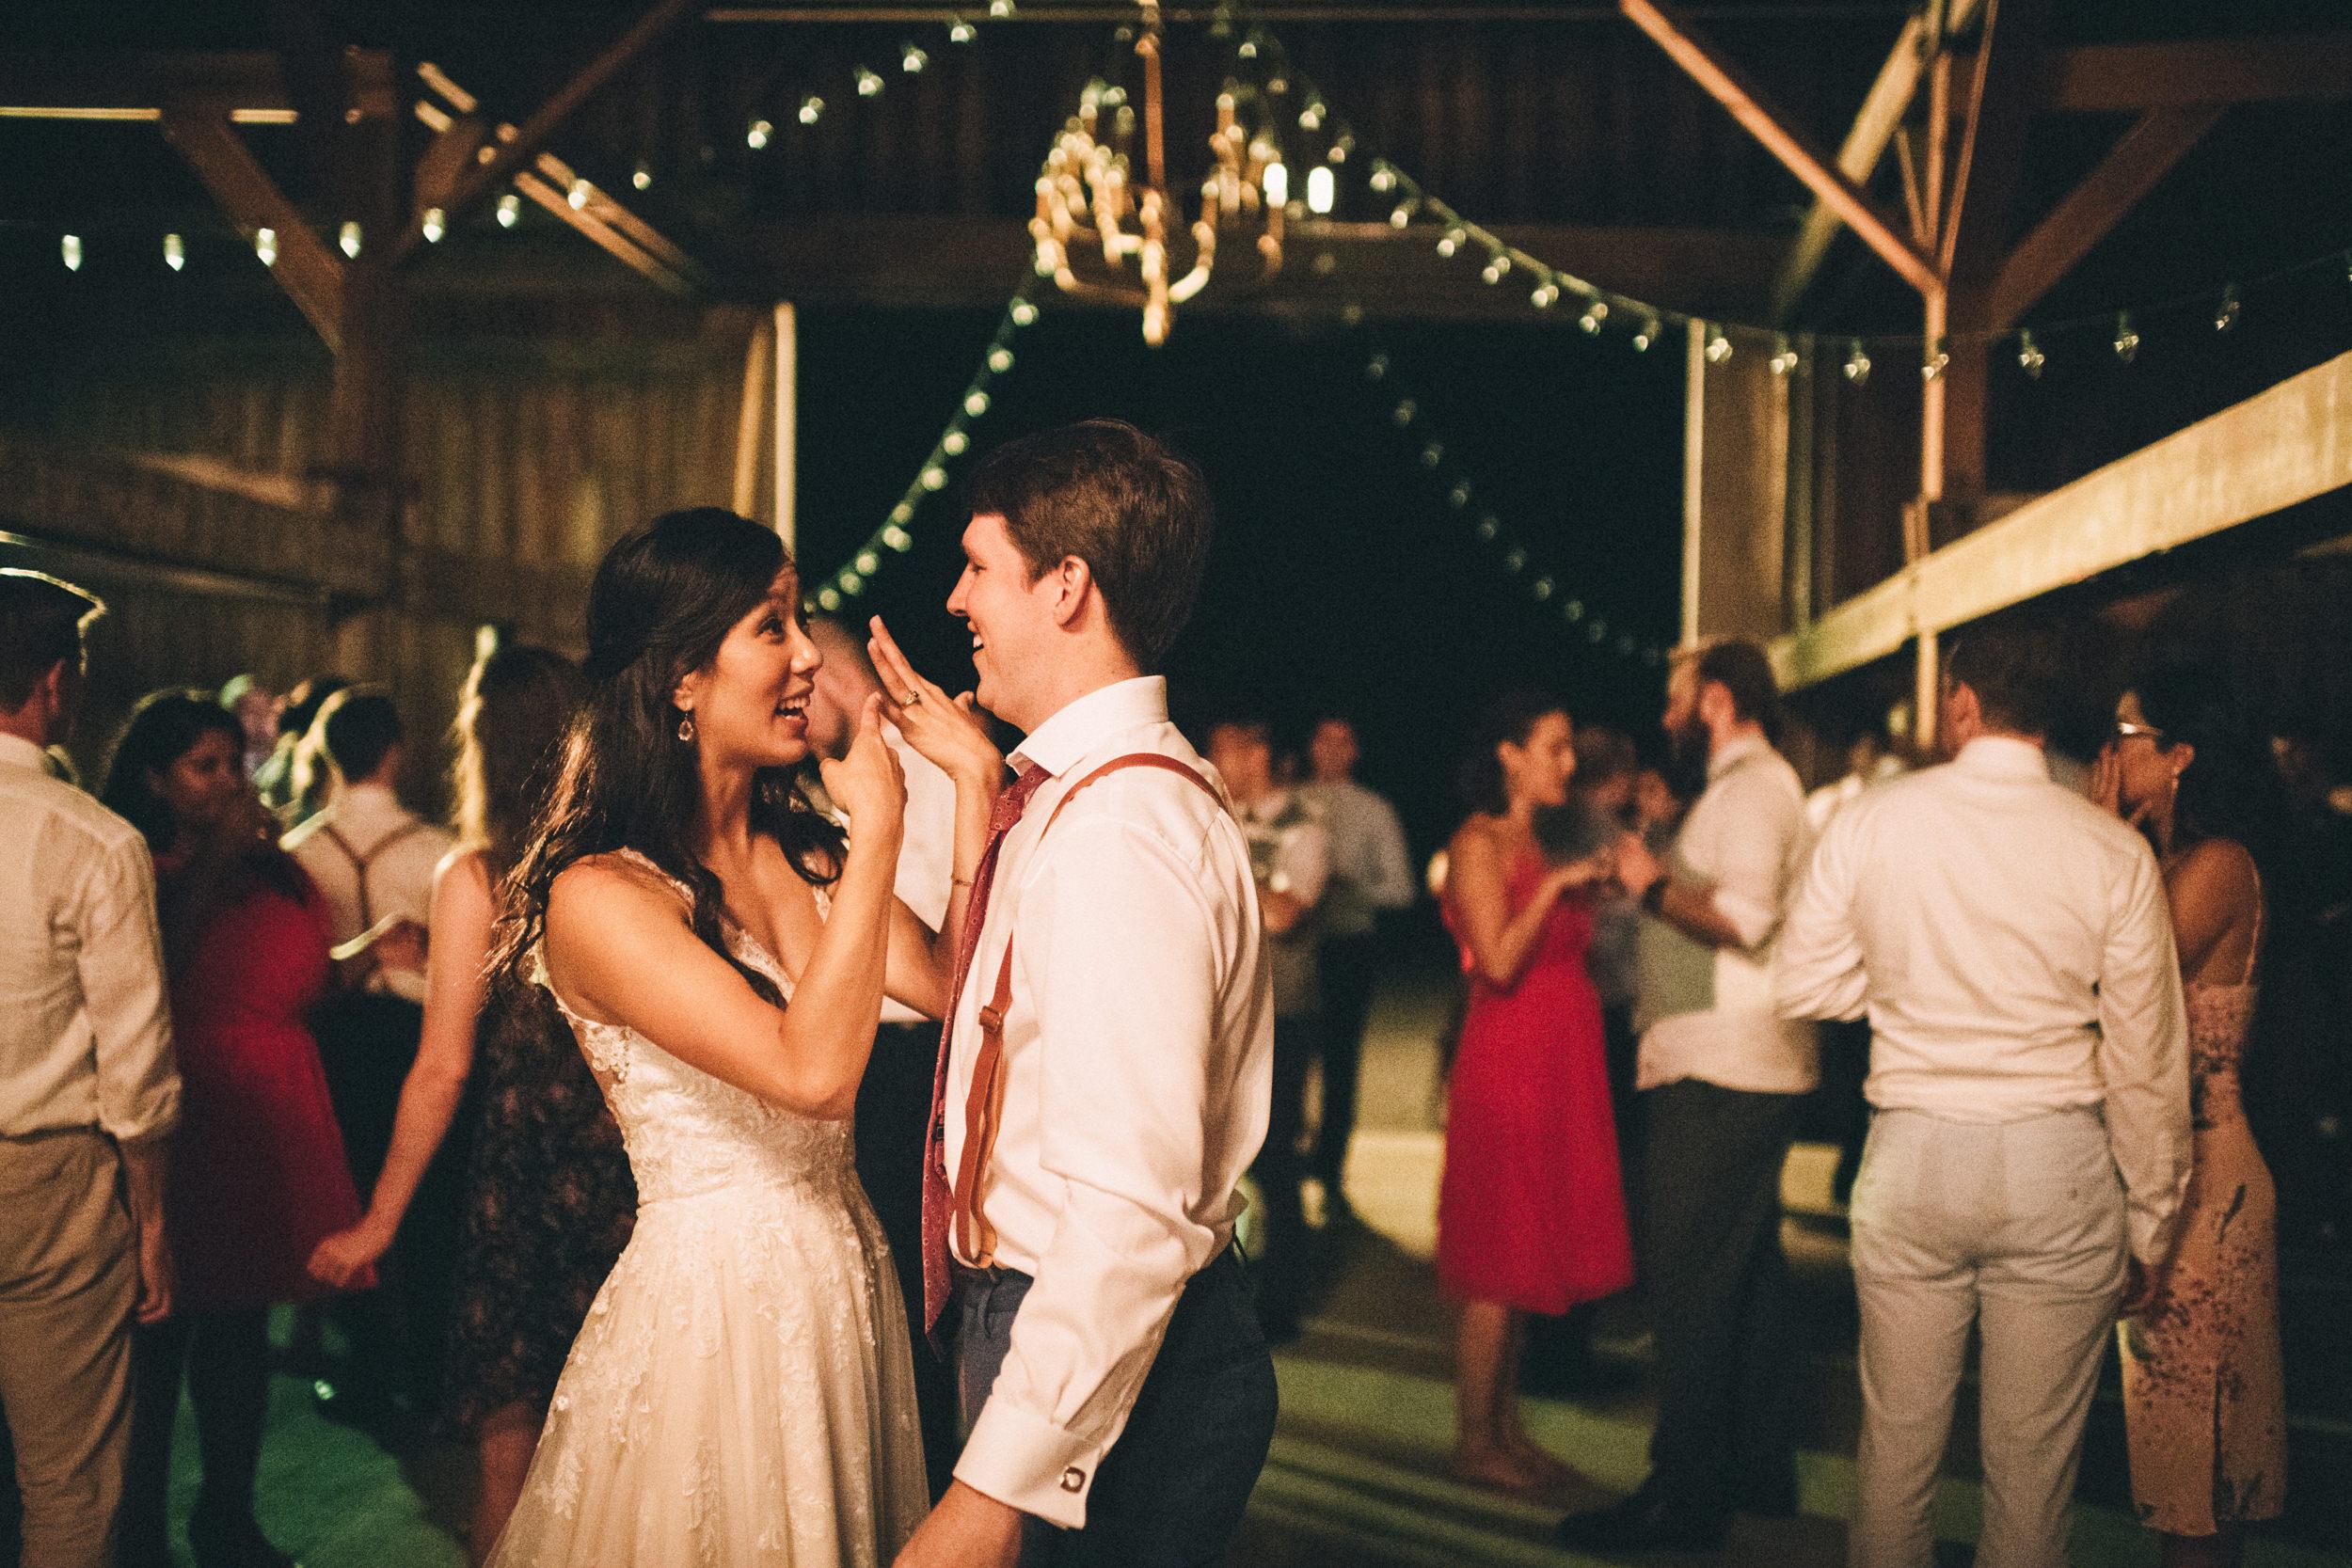 Louisville-Kentucky-Wedding-and-Elopement-Photographer-Sarah-Katherine-Davis-Photography-Summer-Jewel-Toned-Wedding-Chineese-Tea-Ceremony-Warrenwood-Manor-Danville-1107.jpg